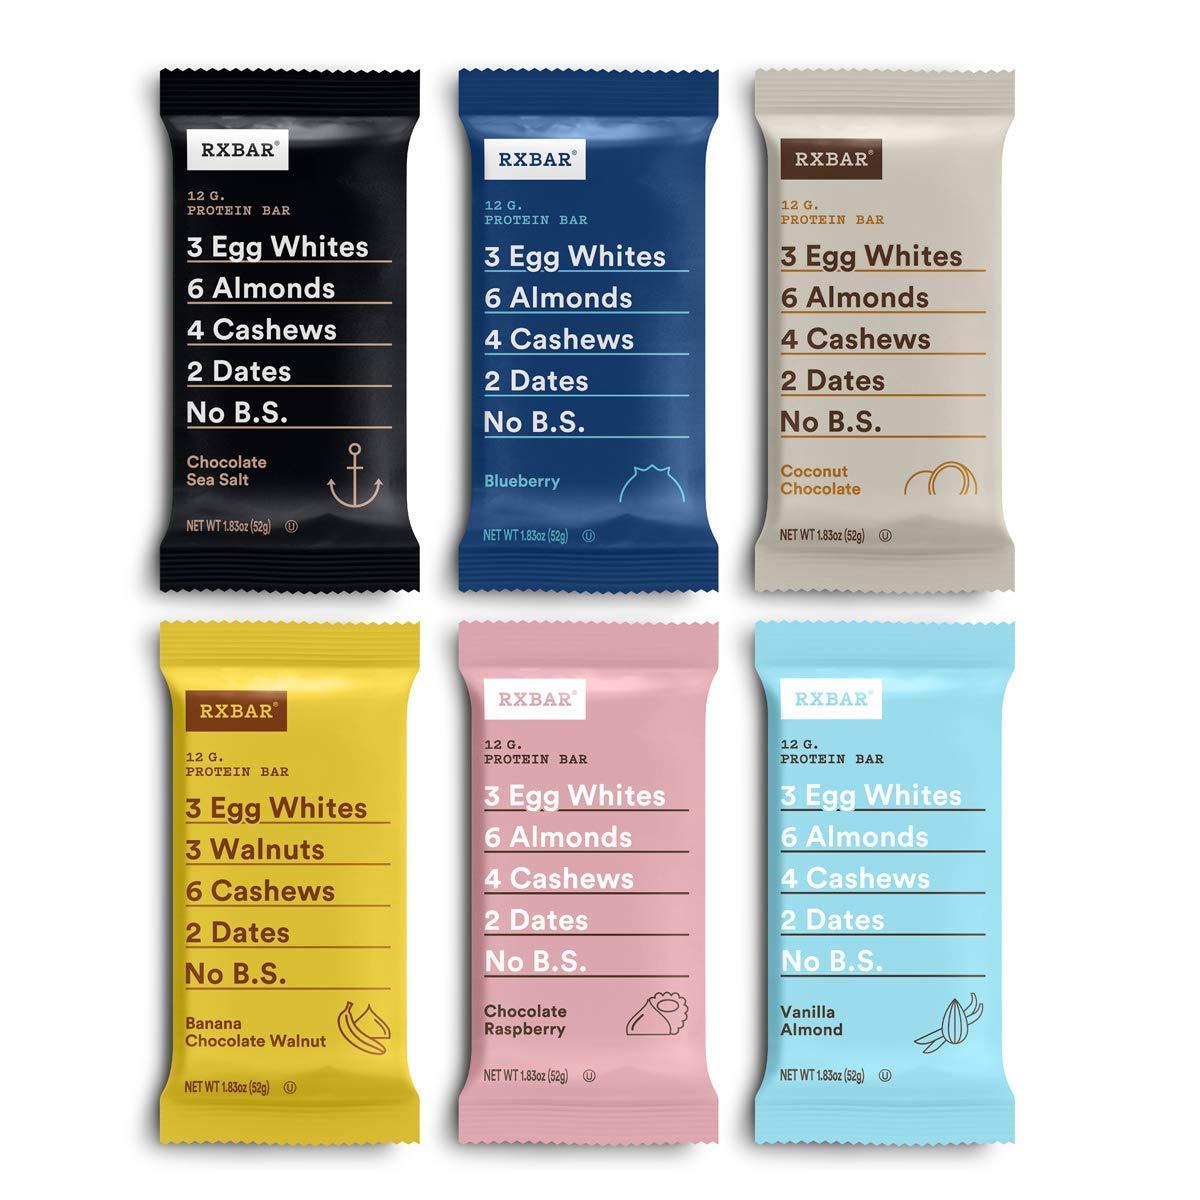 RXBAR Protein bar, Fan Favorite Variety Pack, 12ct, 1.83 Oz